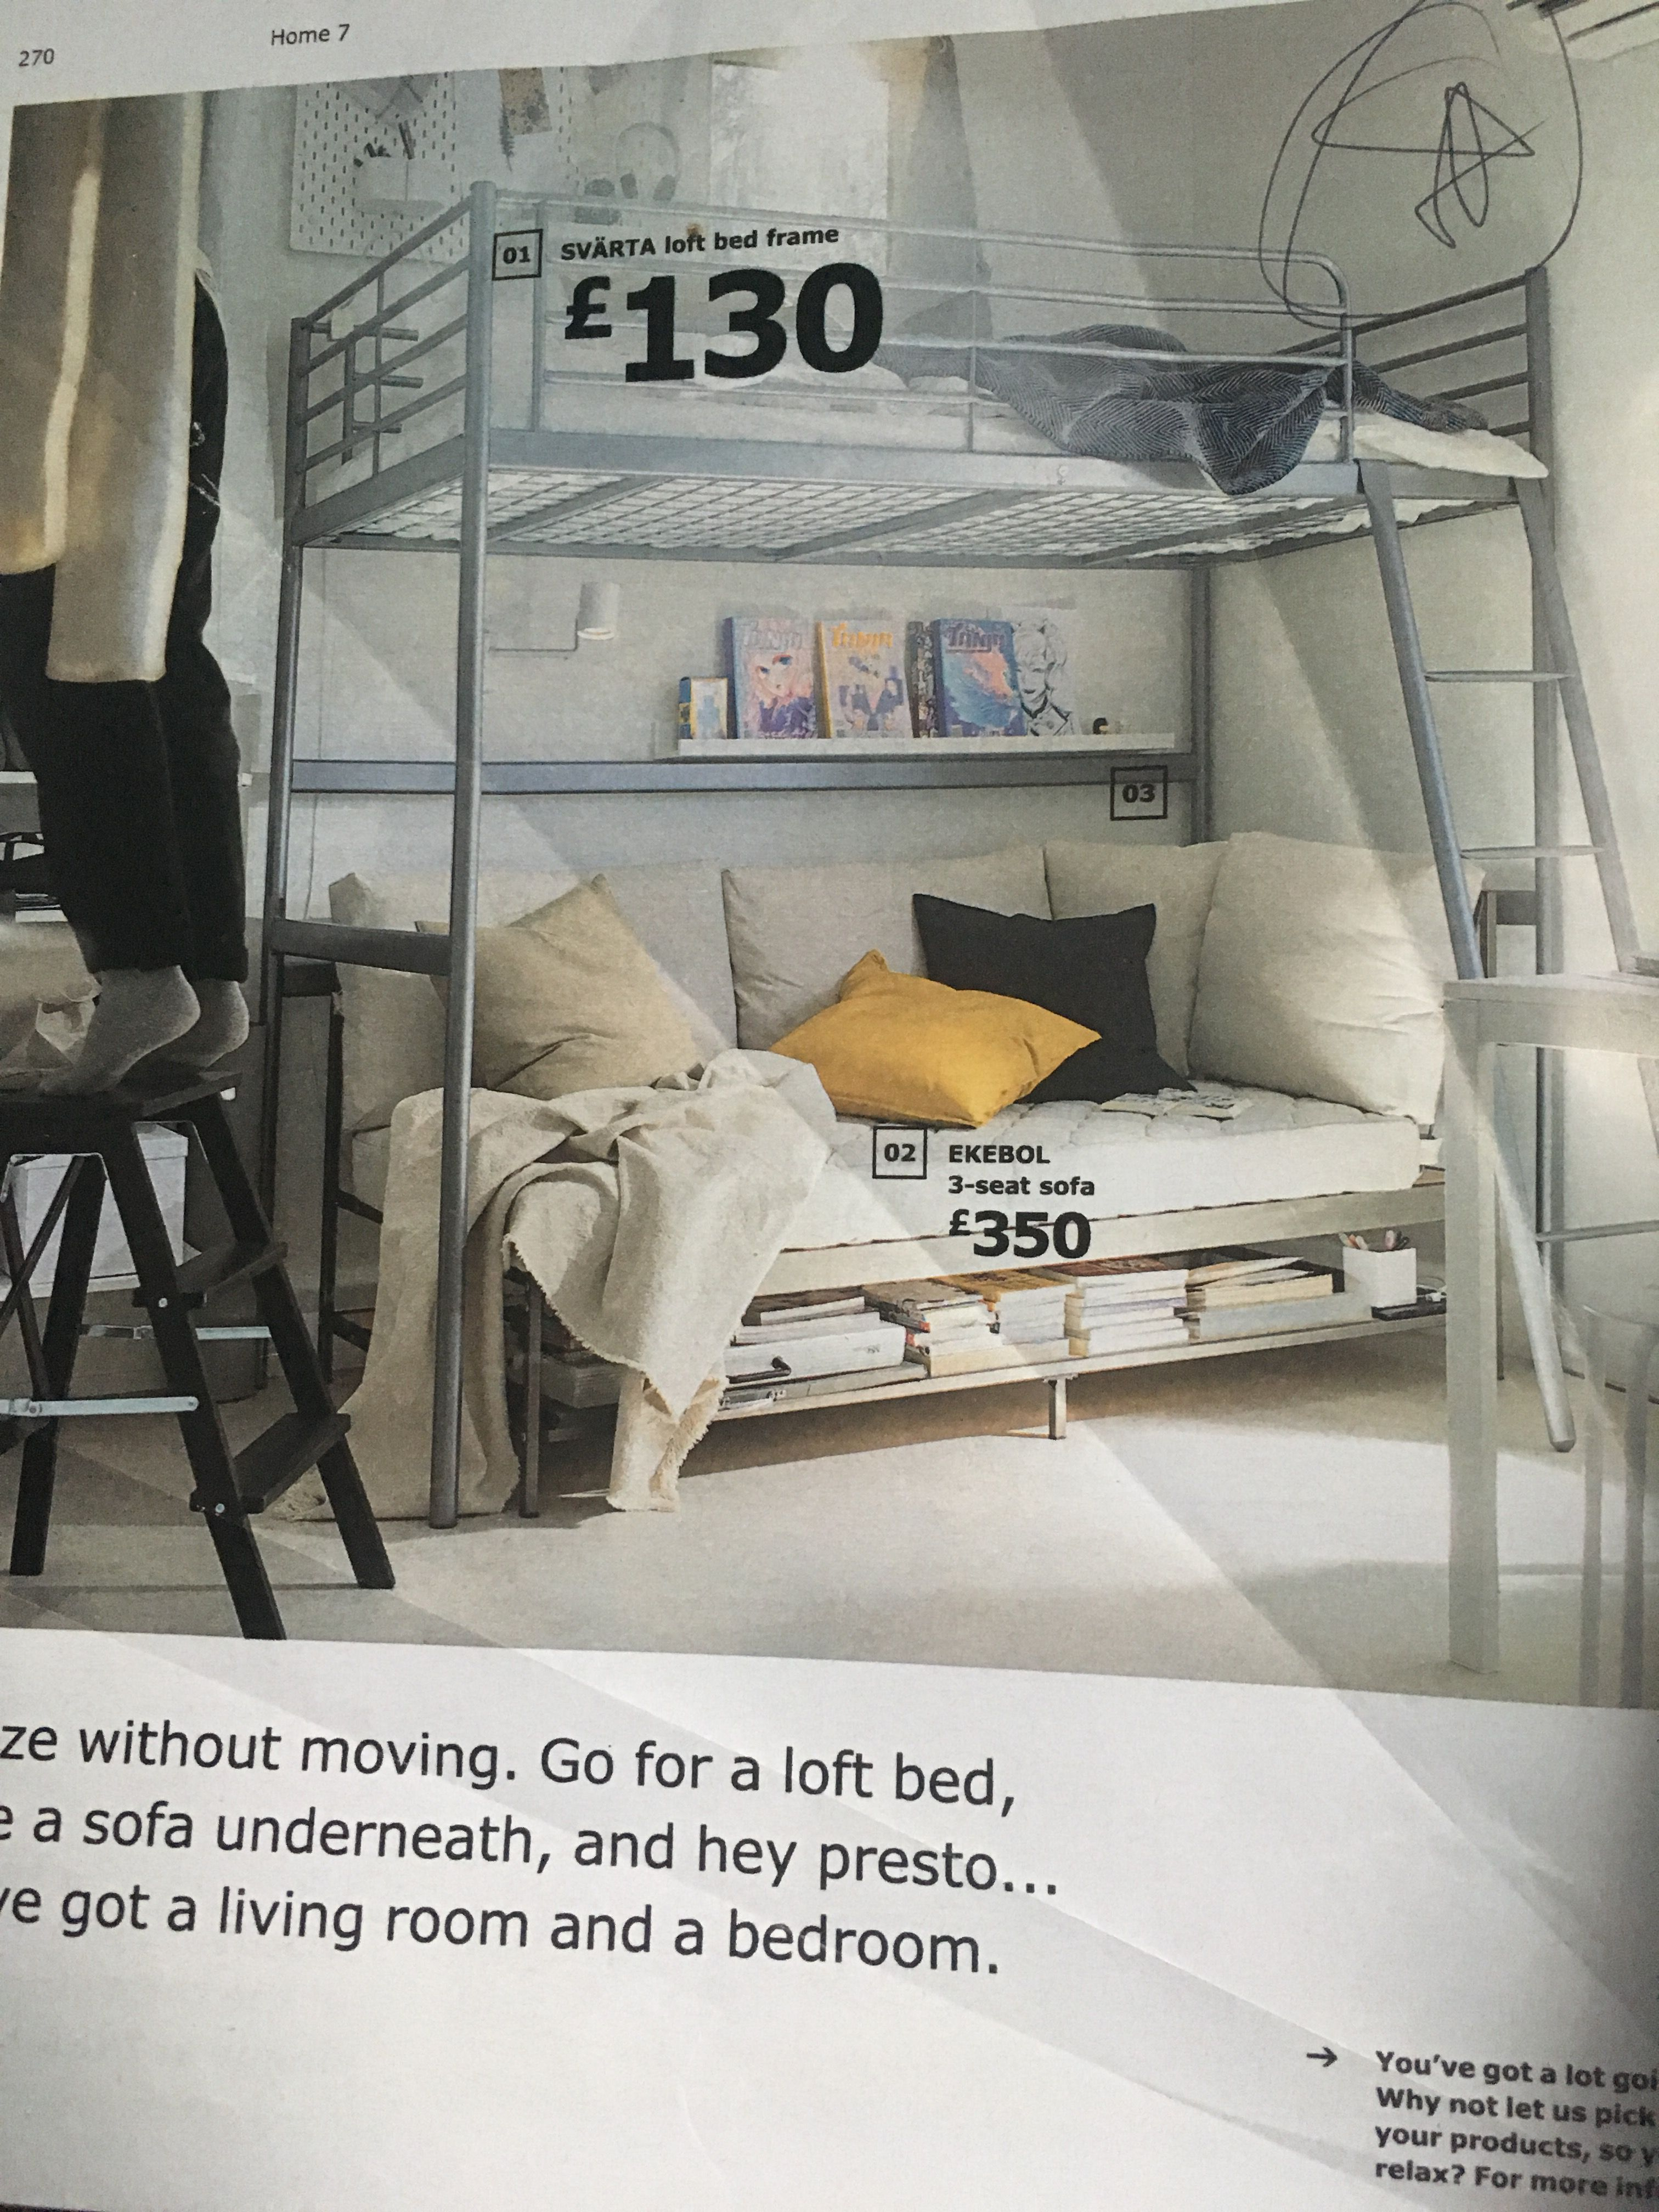 Ikea Svarta Loft Bed Frame Ekebol 3 Seat Sofa Loft Bed Frame